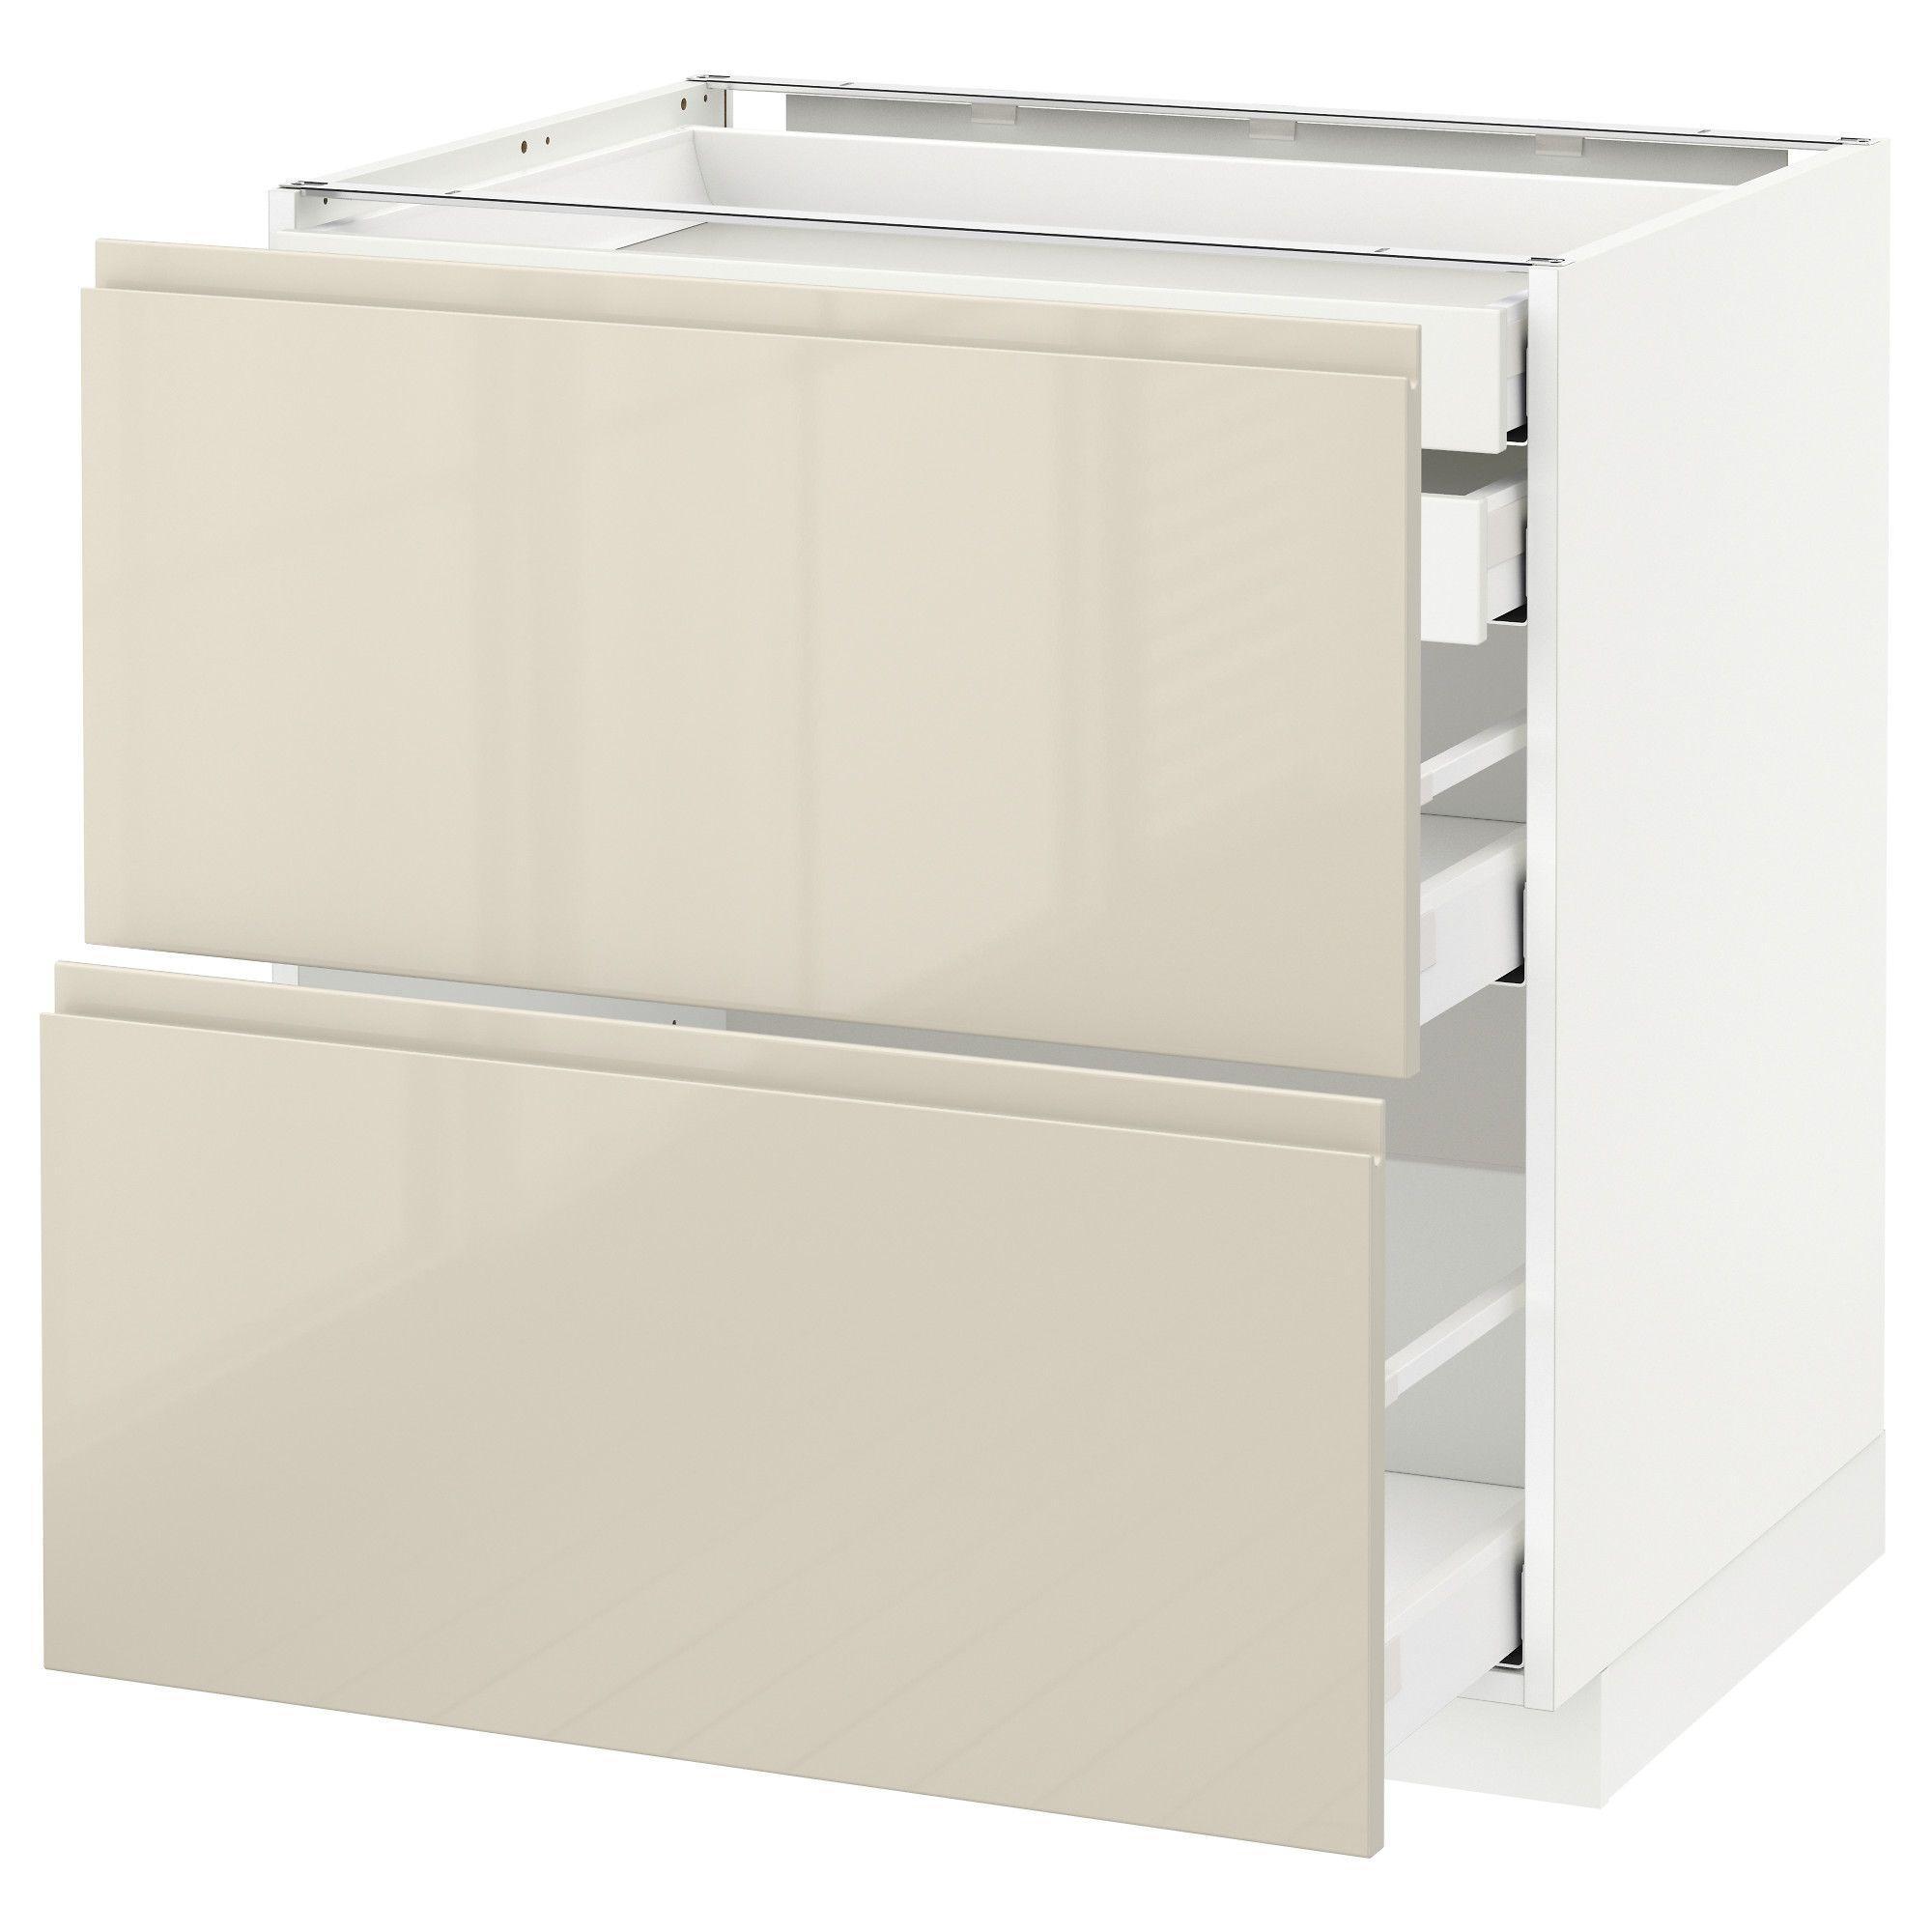 Ikea Metod Unterschrank 40 Cm